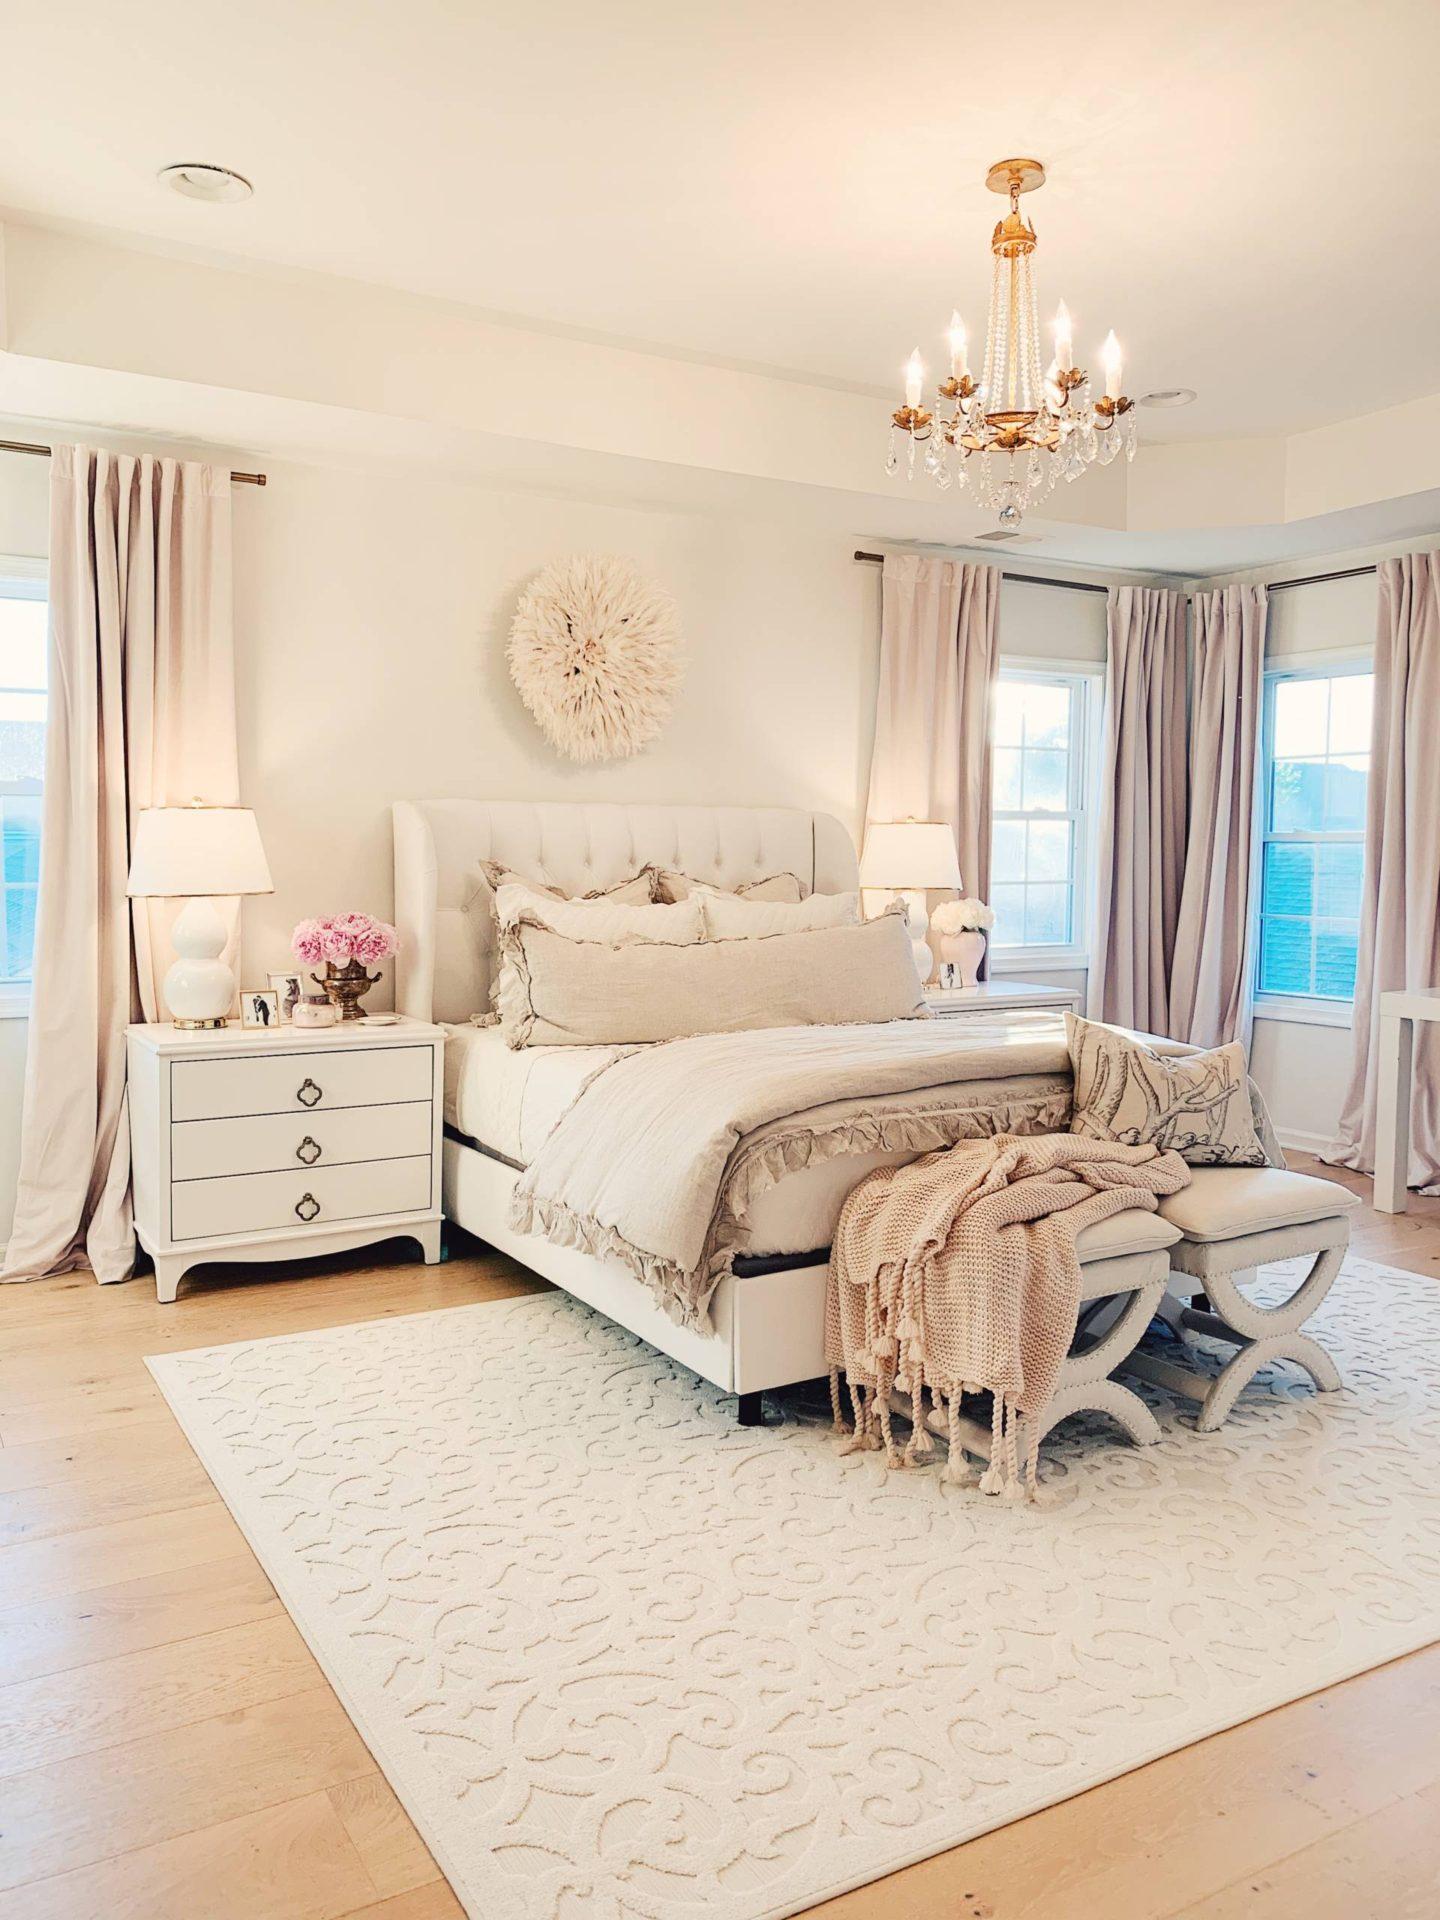 Master Bedroom Decor: a Cozy & Romantic Master Bedroom ... on Master Bedroom Curtains  id=77717